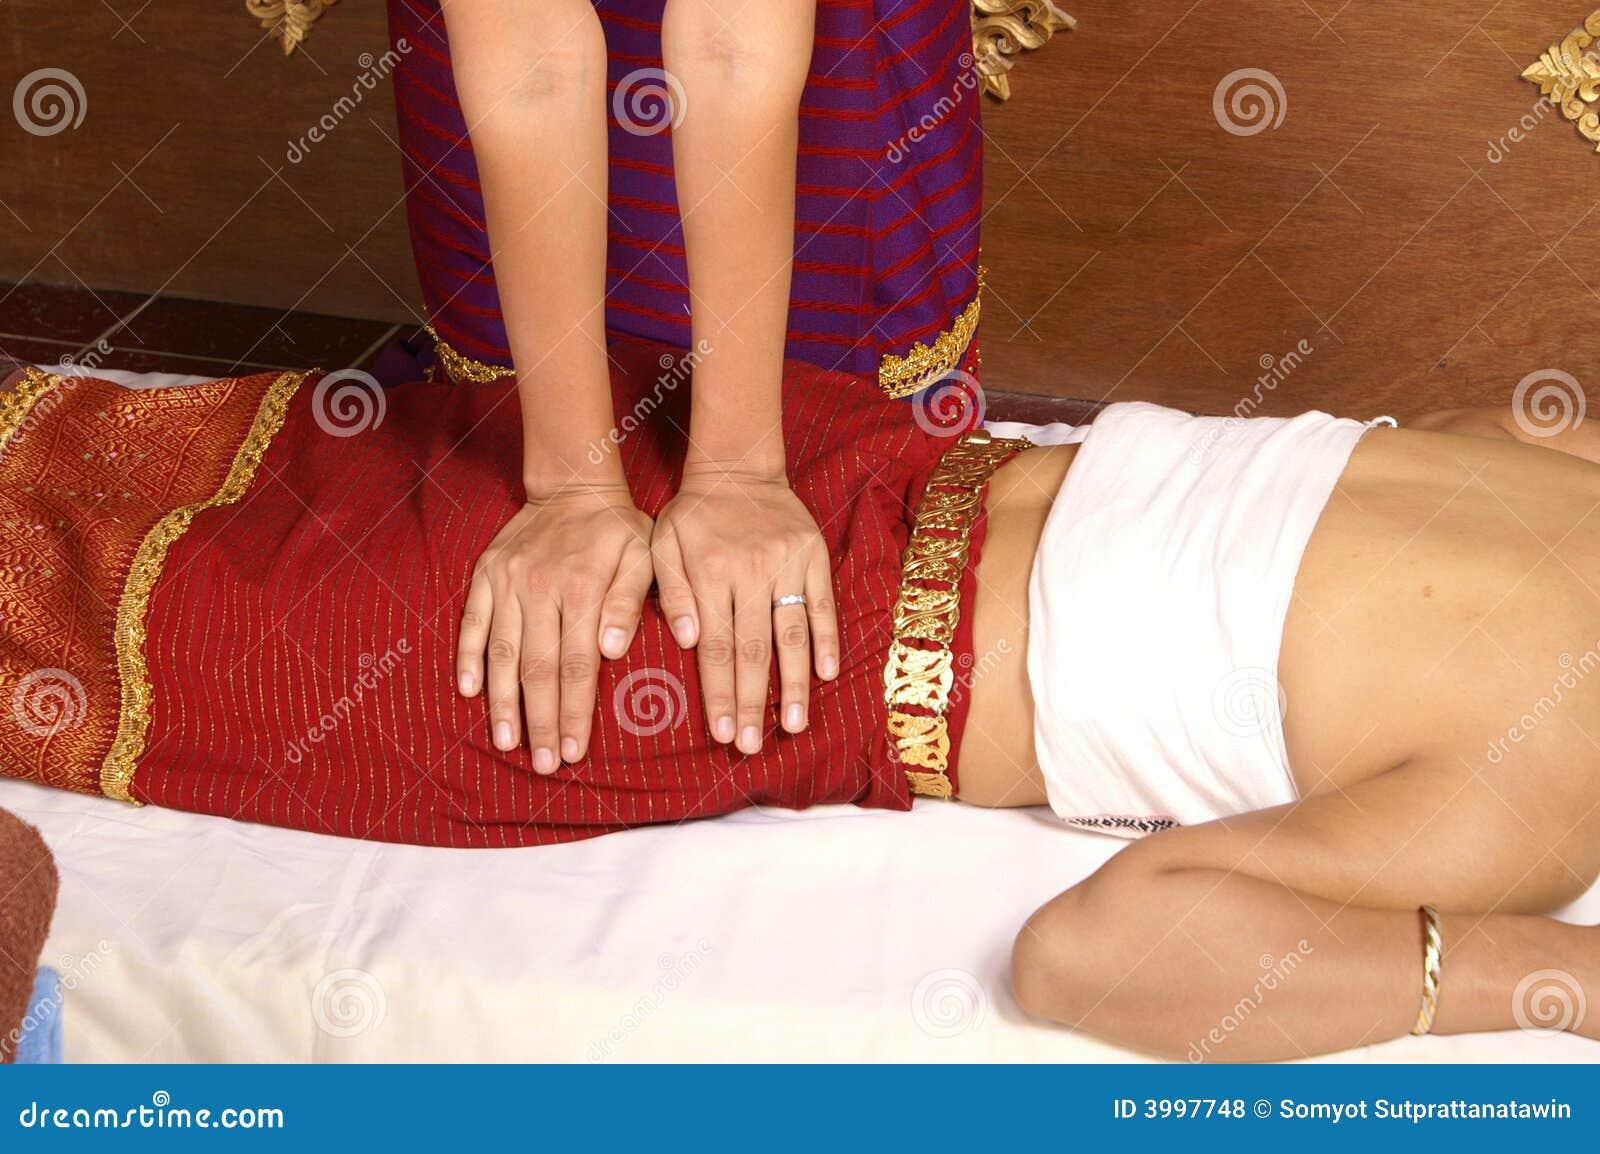 helt gratis dejting vieng thai malmö